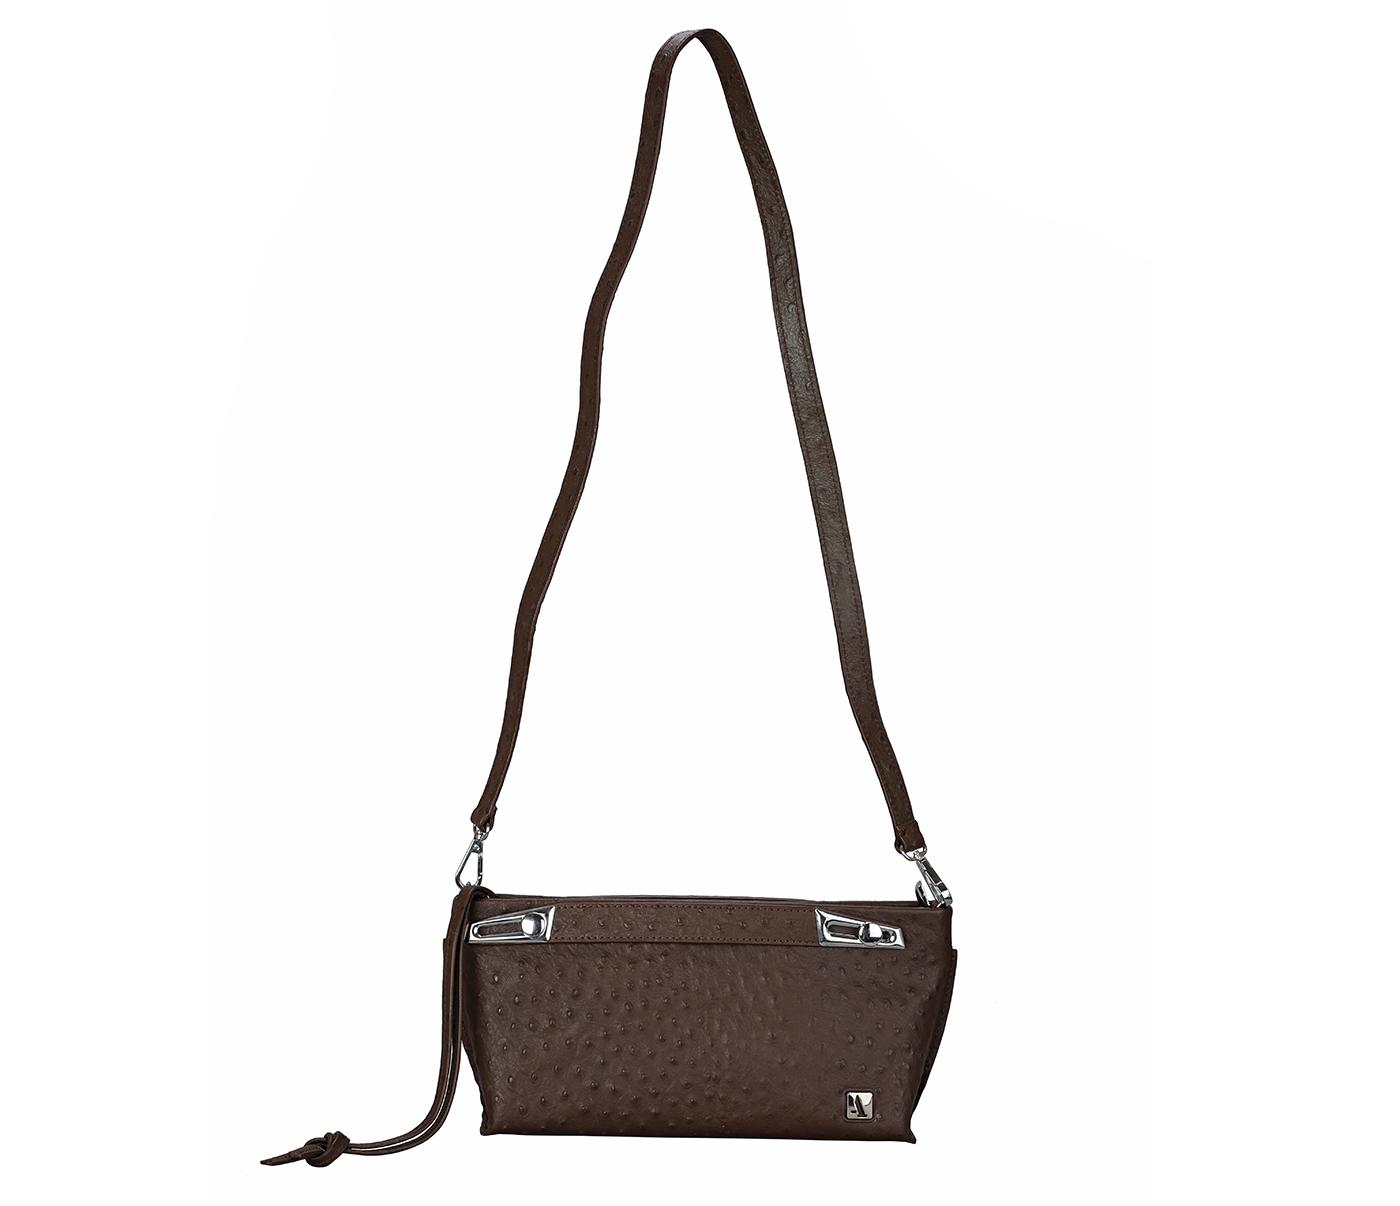 B875-Senobia-Evening Bag in Genuine Leather - Brown